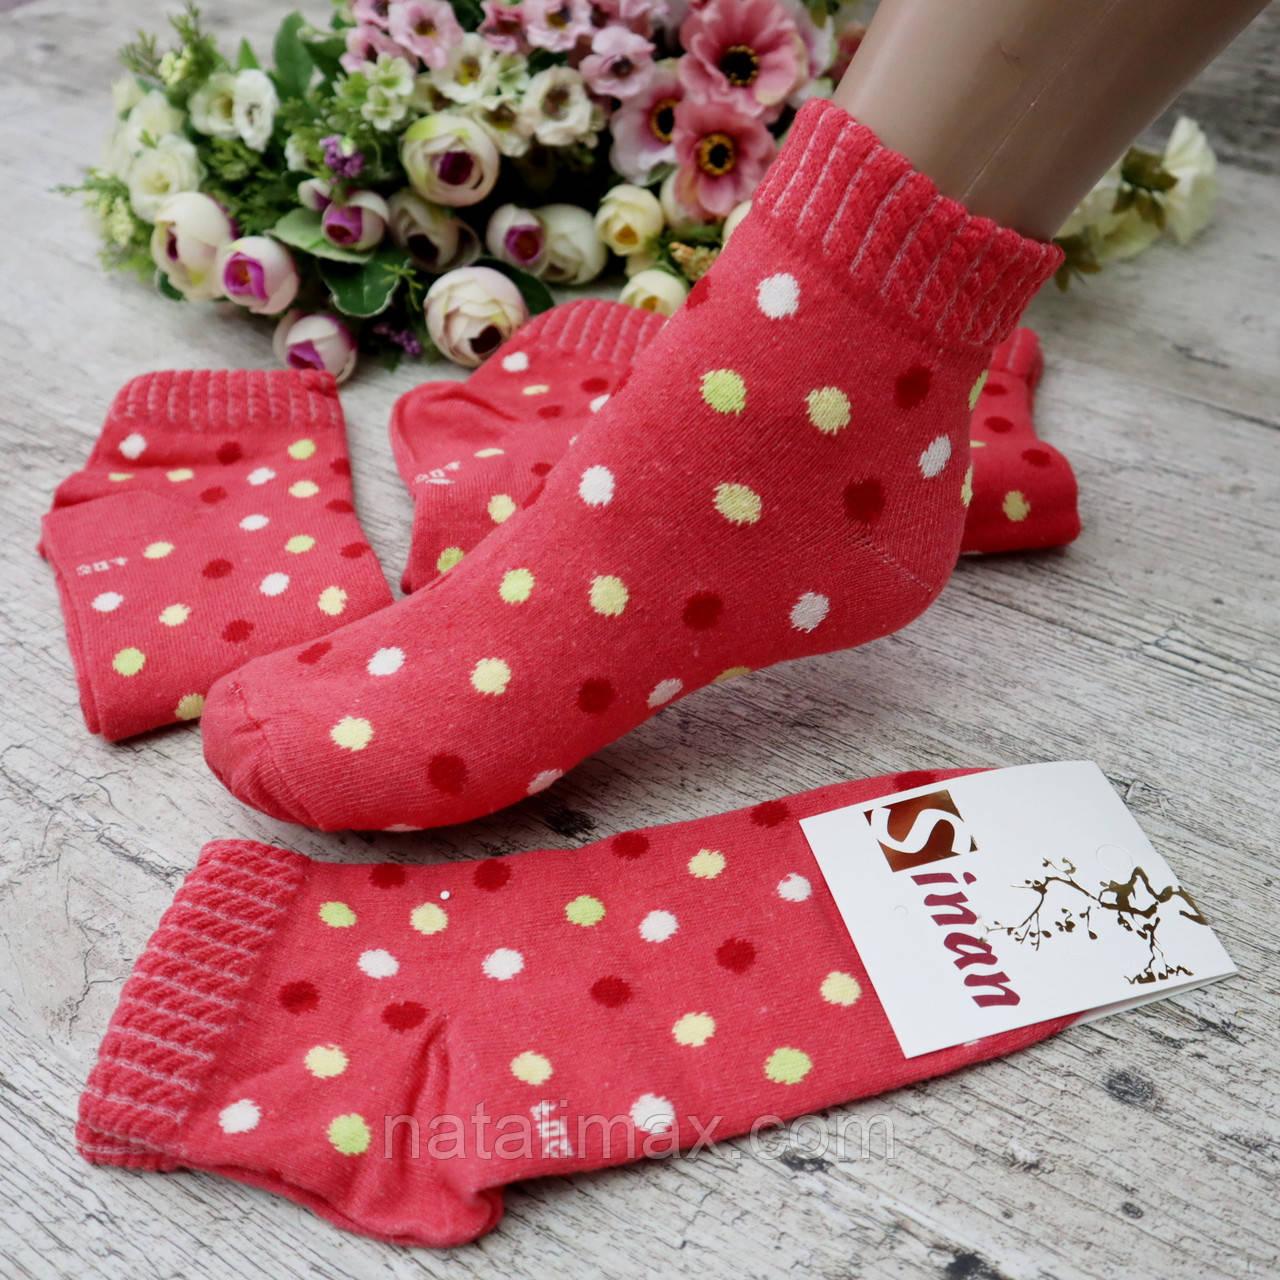 "Носочки женские ""Sinan"", размер 36-40. Женские носки, носки для женщин"